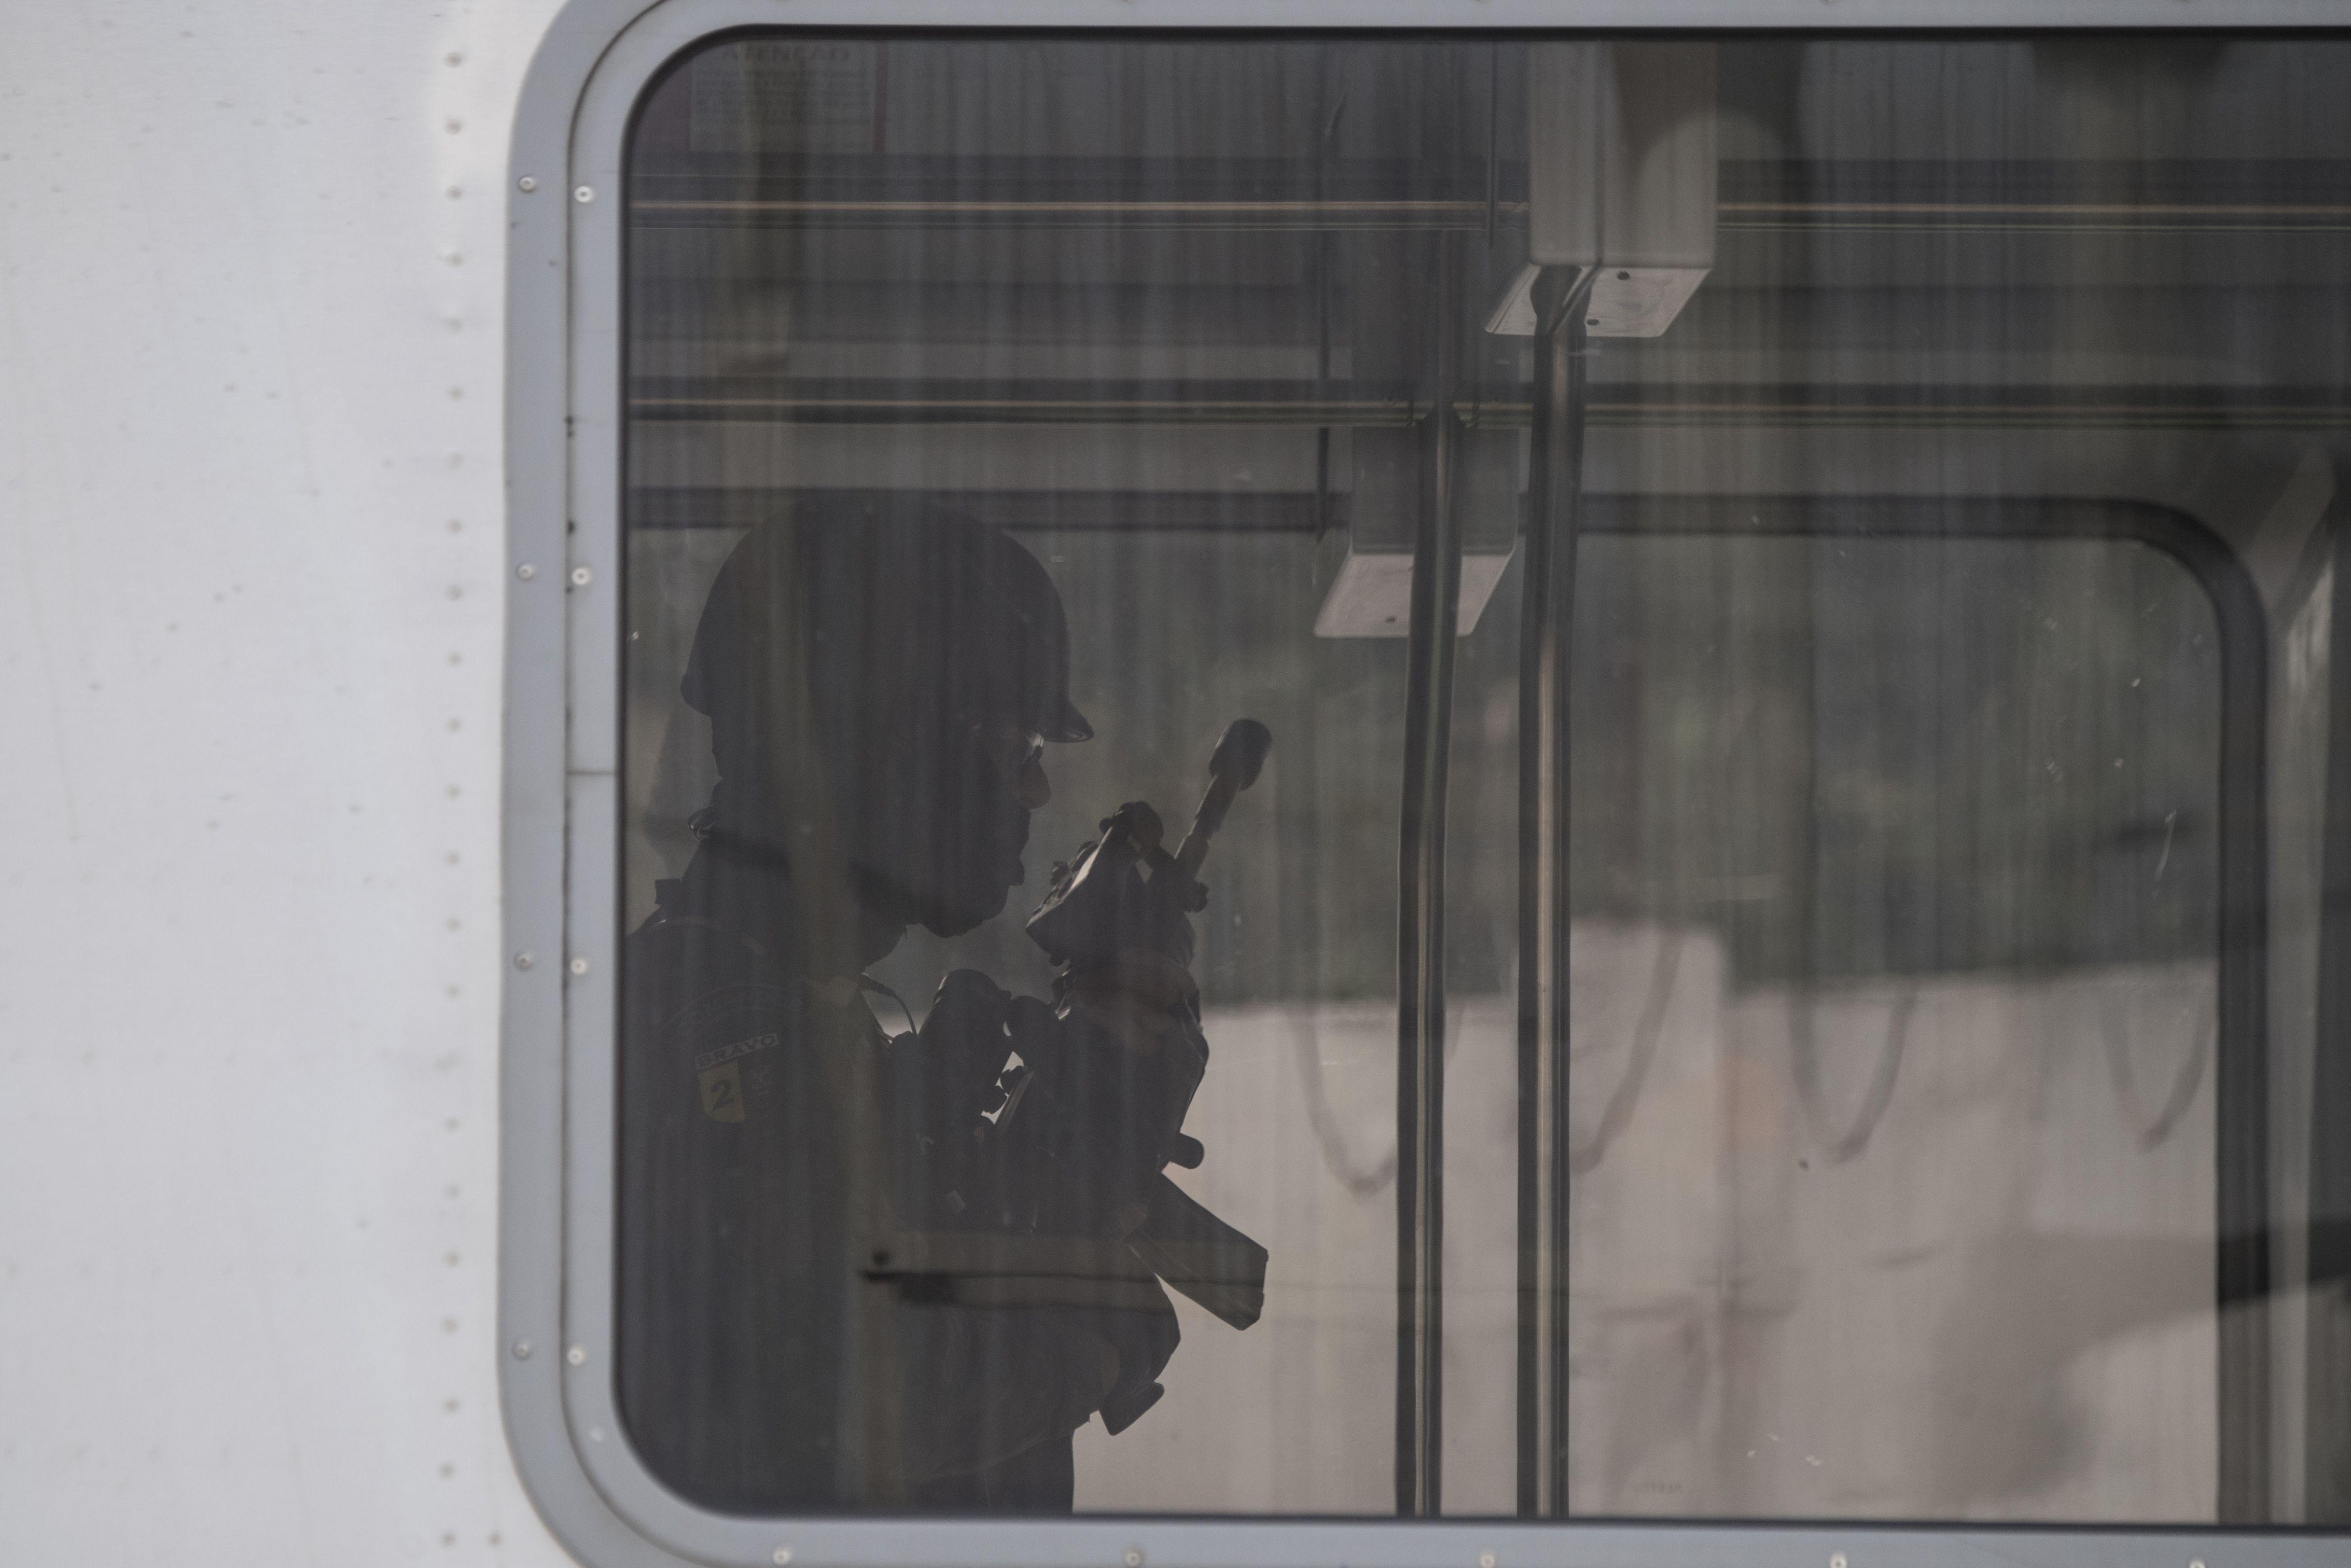 Así simularon un atentado terrorista en Río de Janeiro